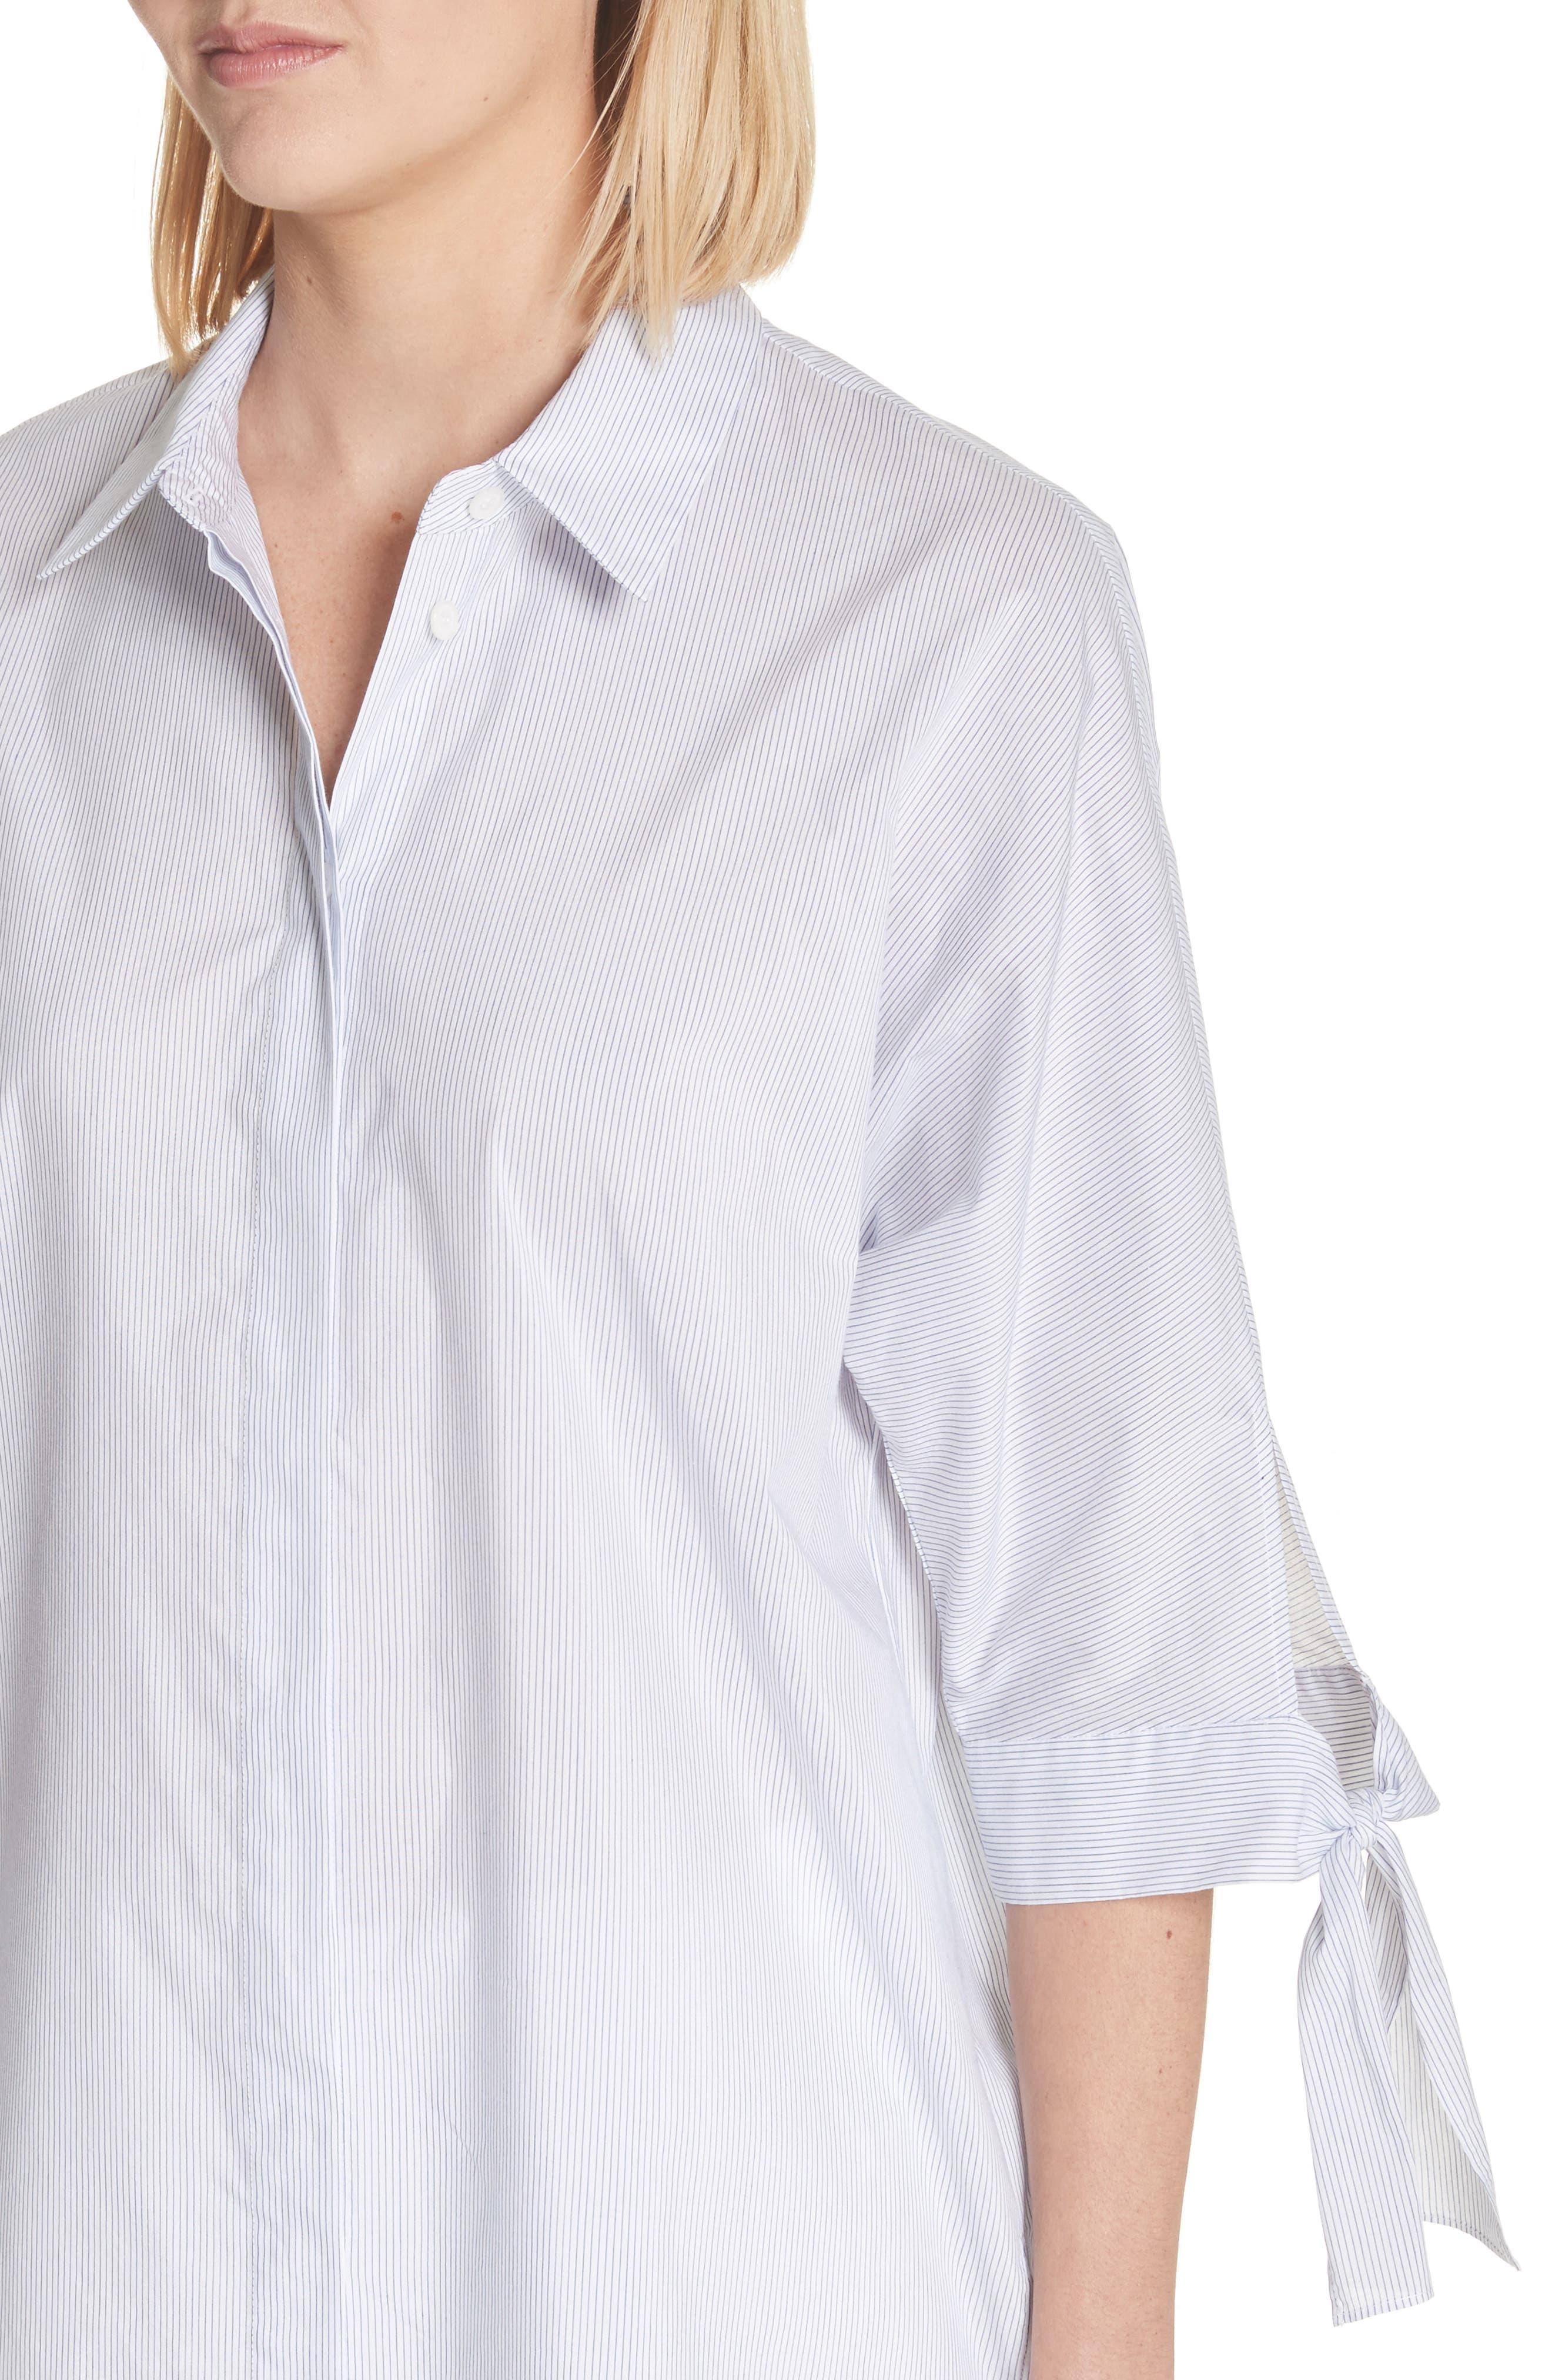 Breezy Stripe Saige Blouse,                             Alternate thumbnail 4, color,                             White Multi